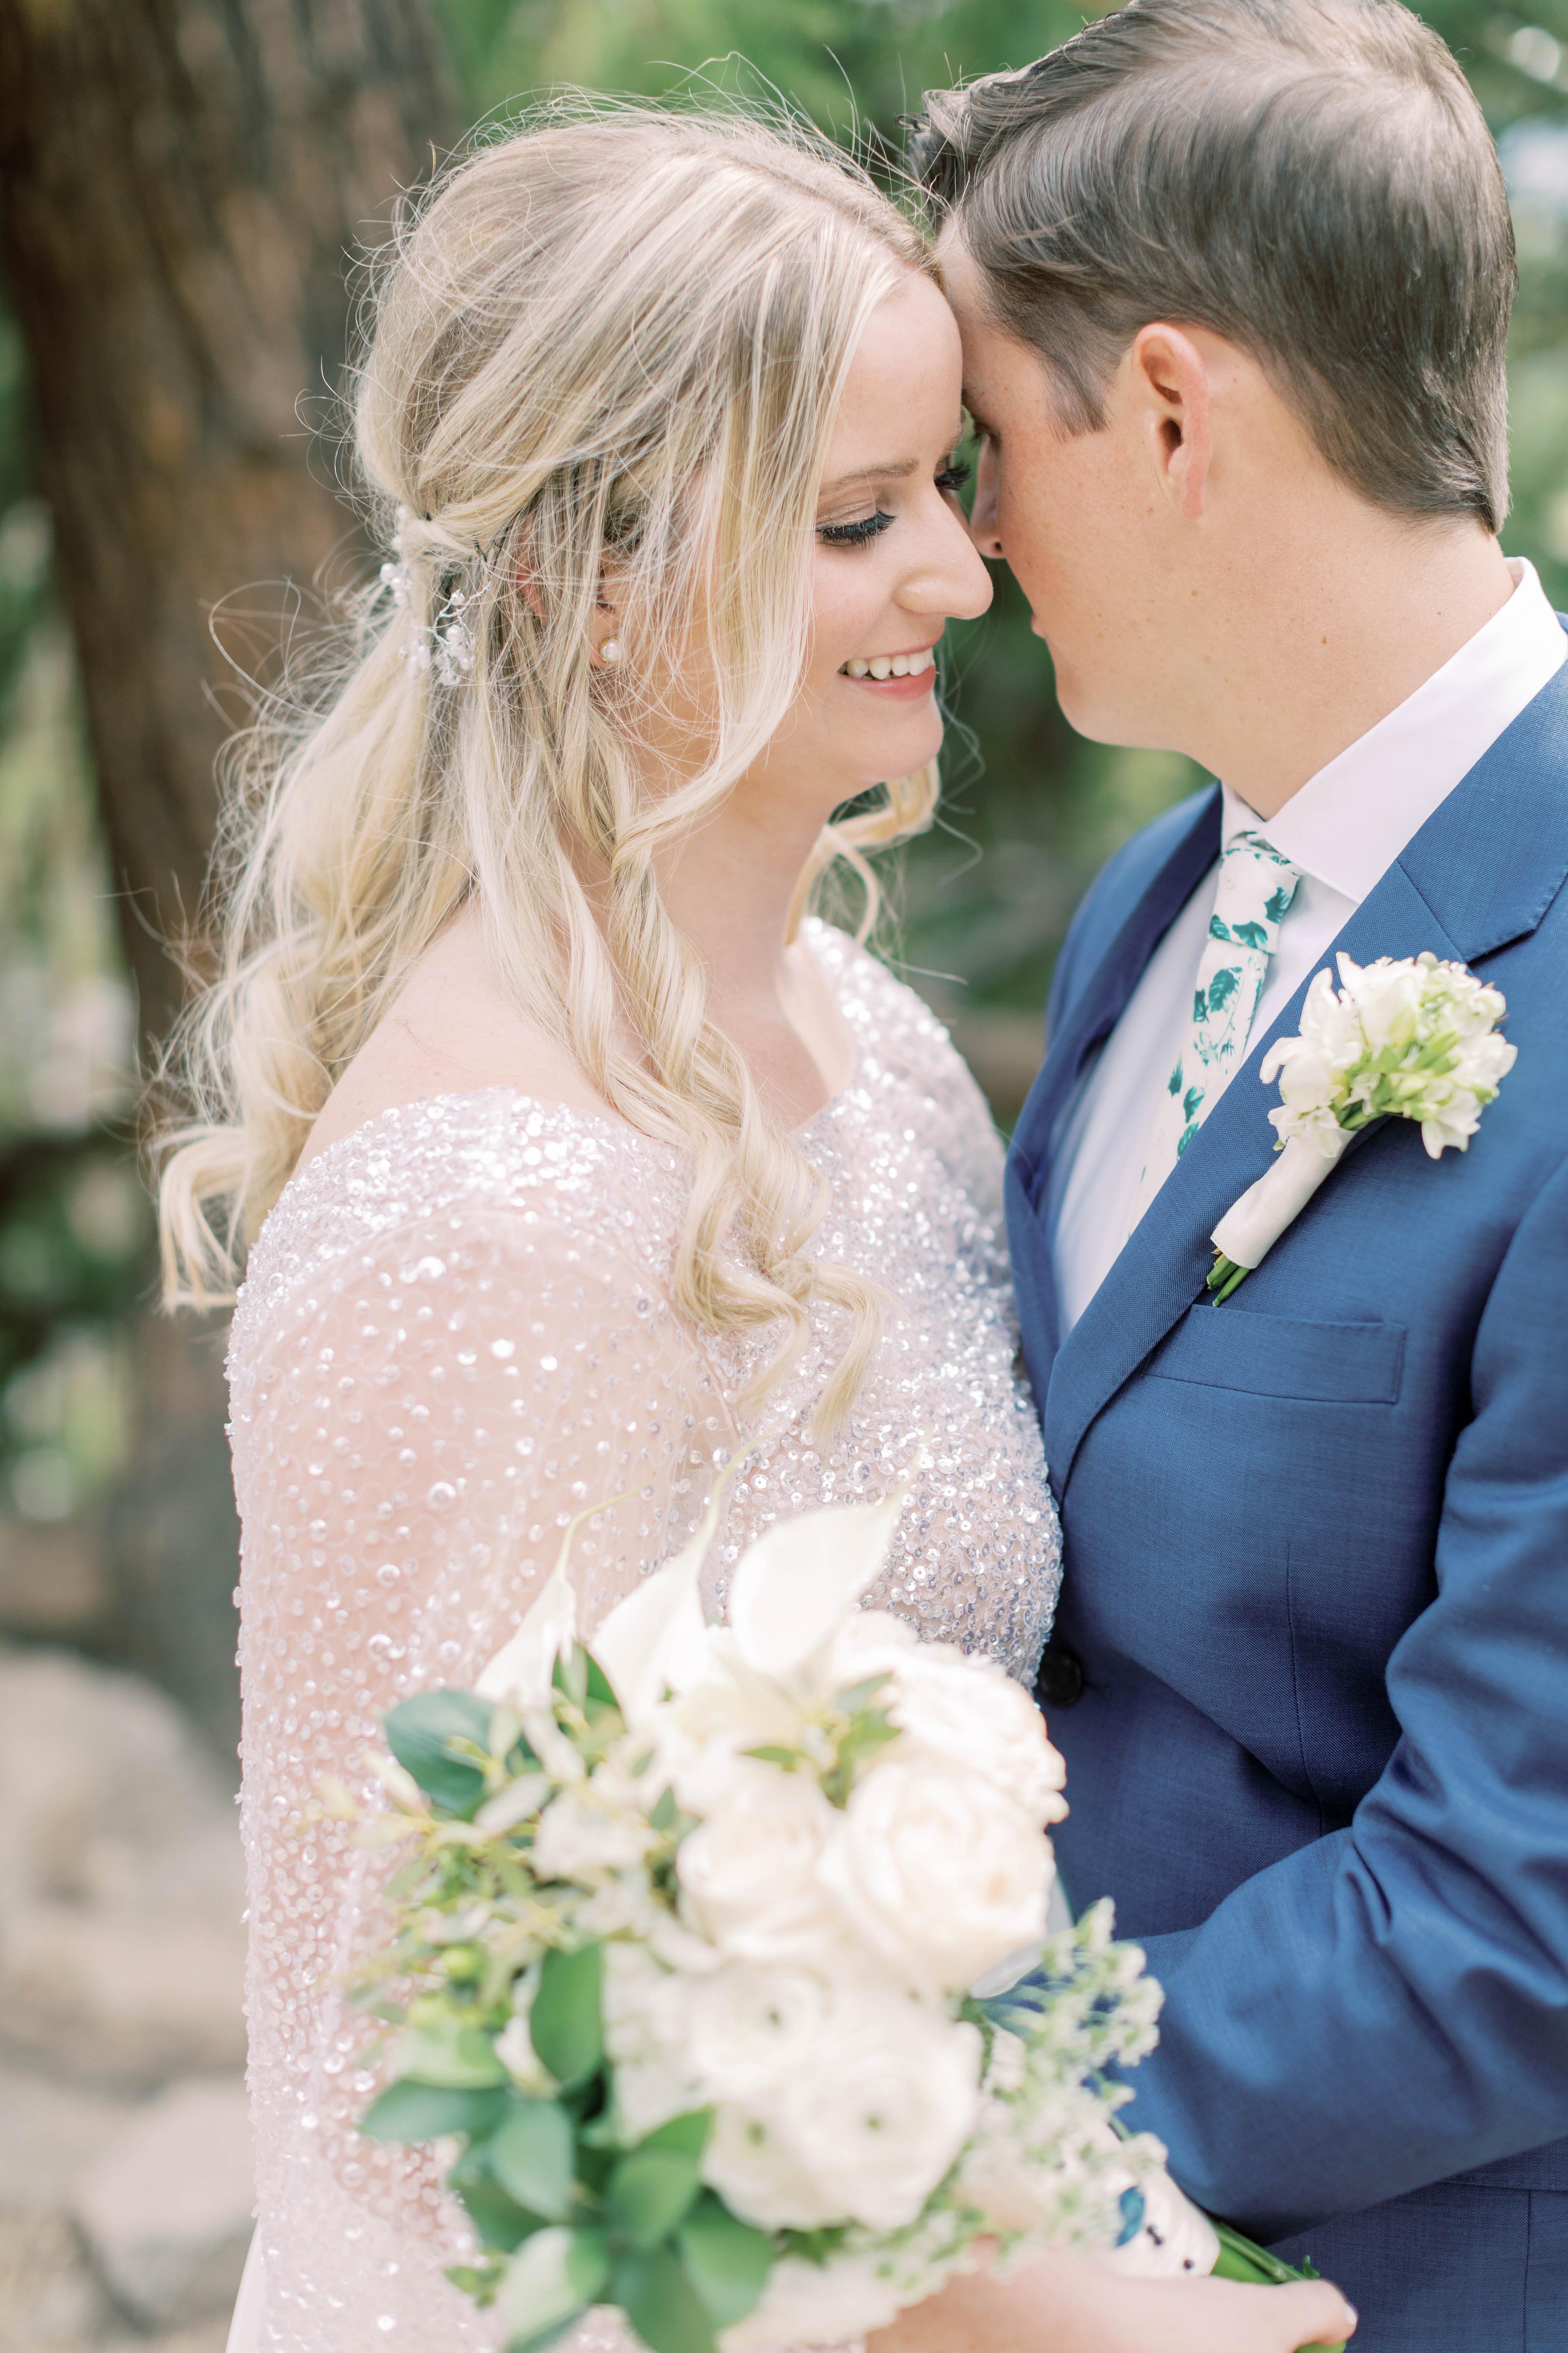 Wedding Floral Design Consultation